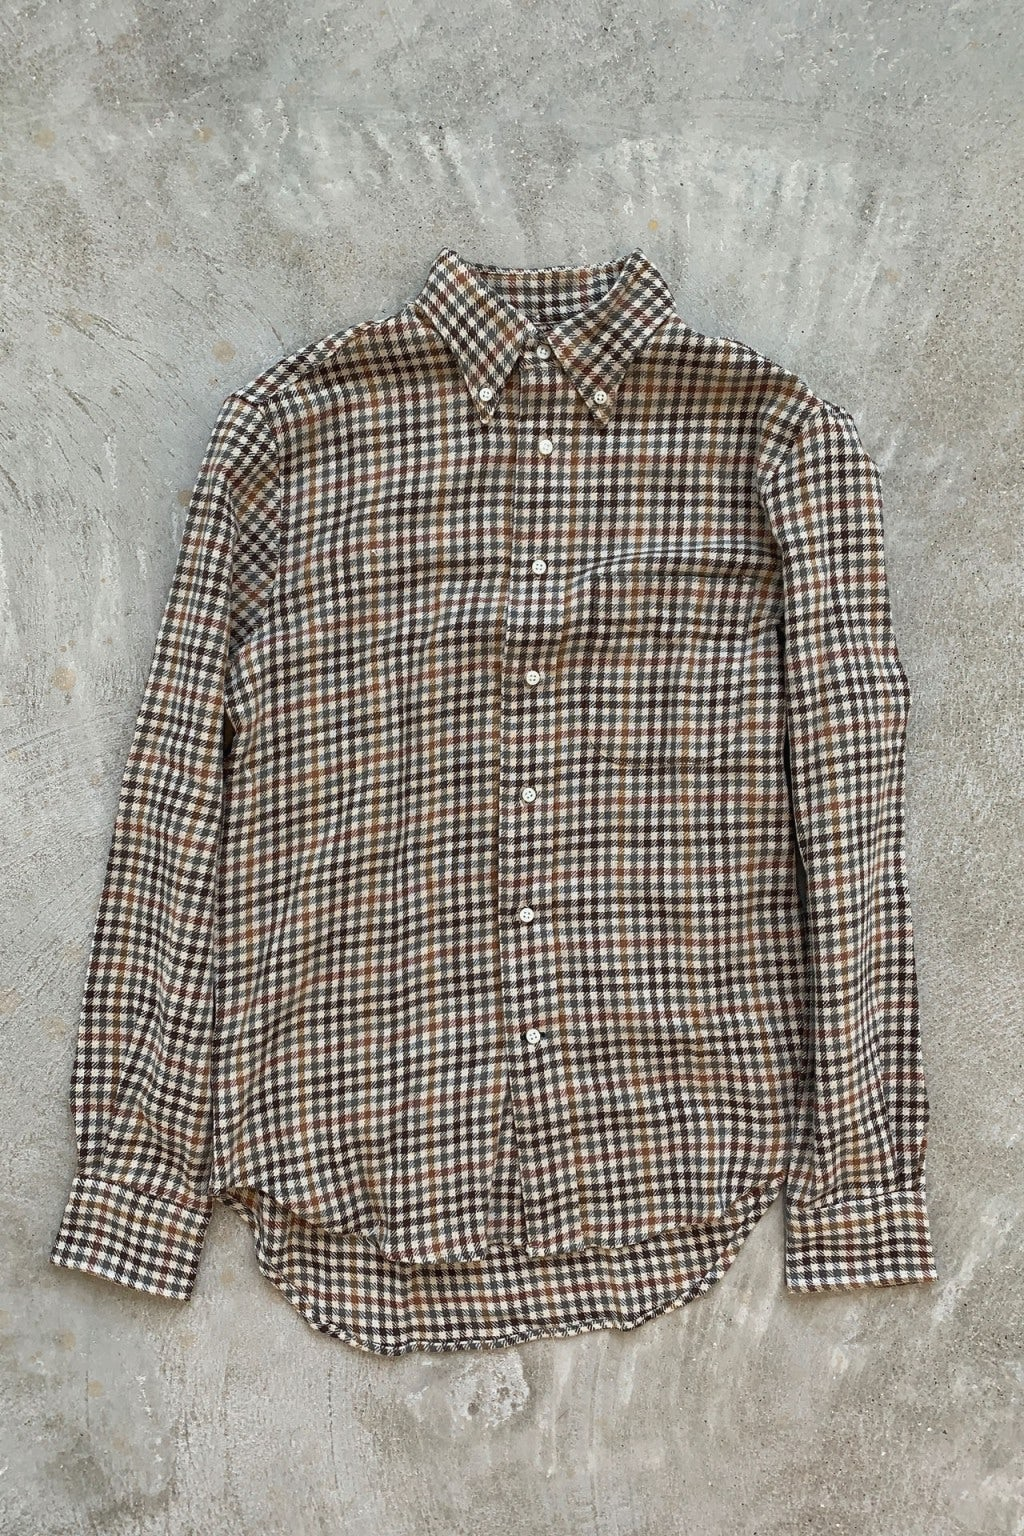 Gitman Bros. Vintage Long Sleeve Button Down  Brown Gingham Check